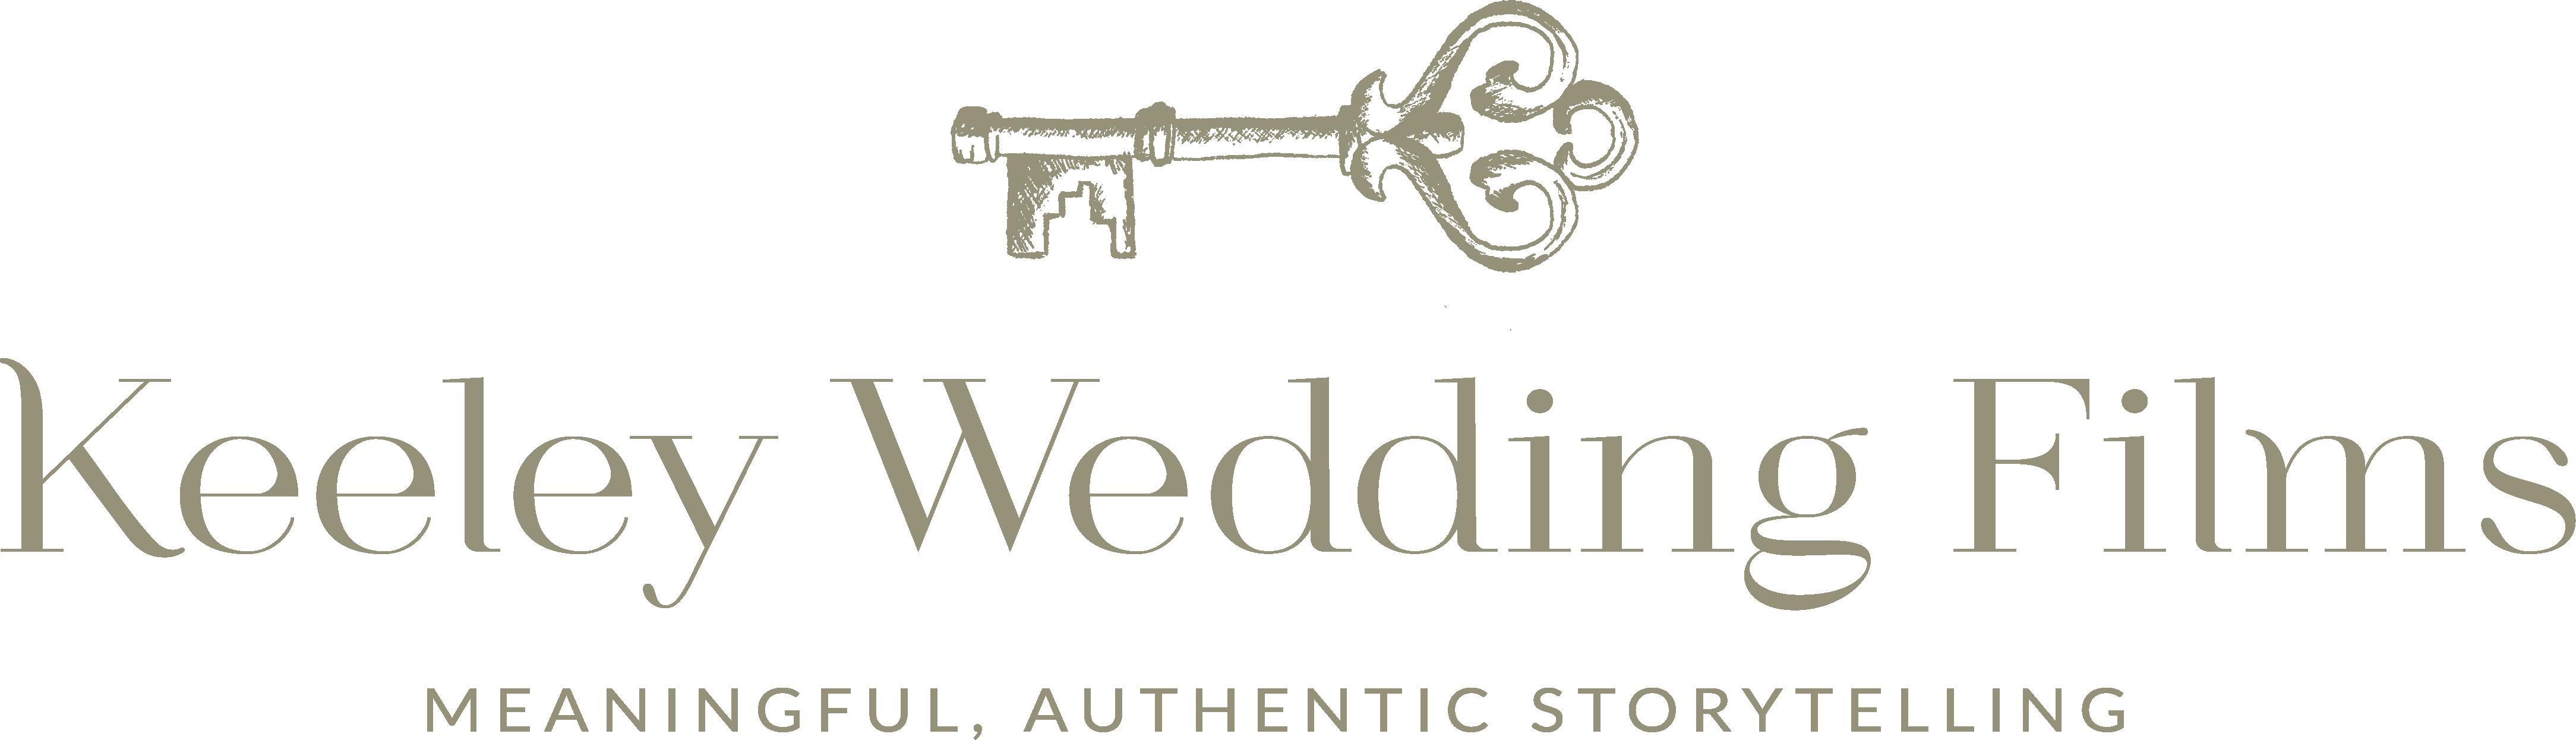 Keeley Wedding Films